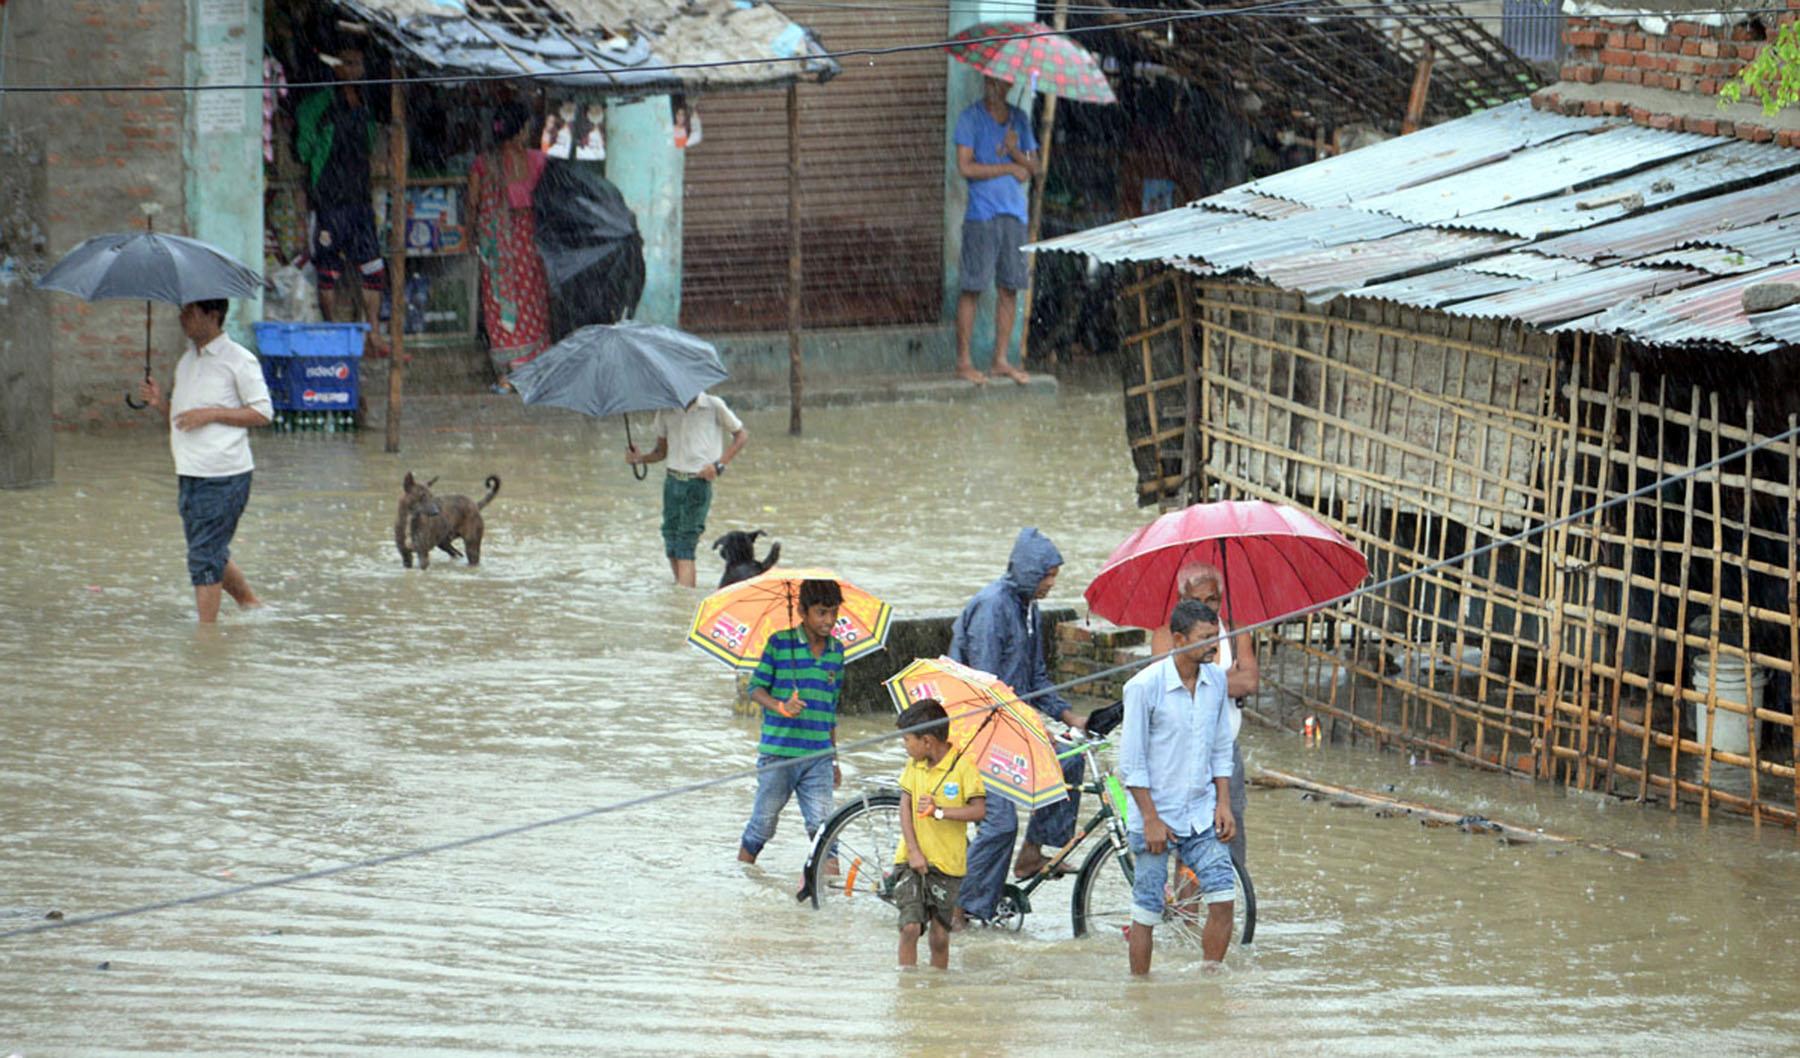 वर्षाका कारण कर्णालीका पहाडी जिल्लामा हवाई उडान ठप्प